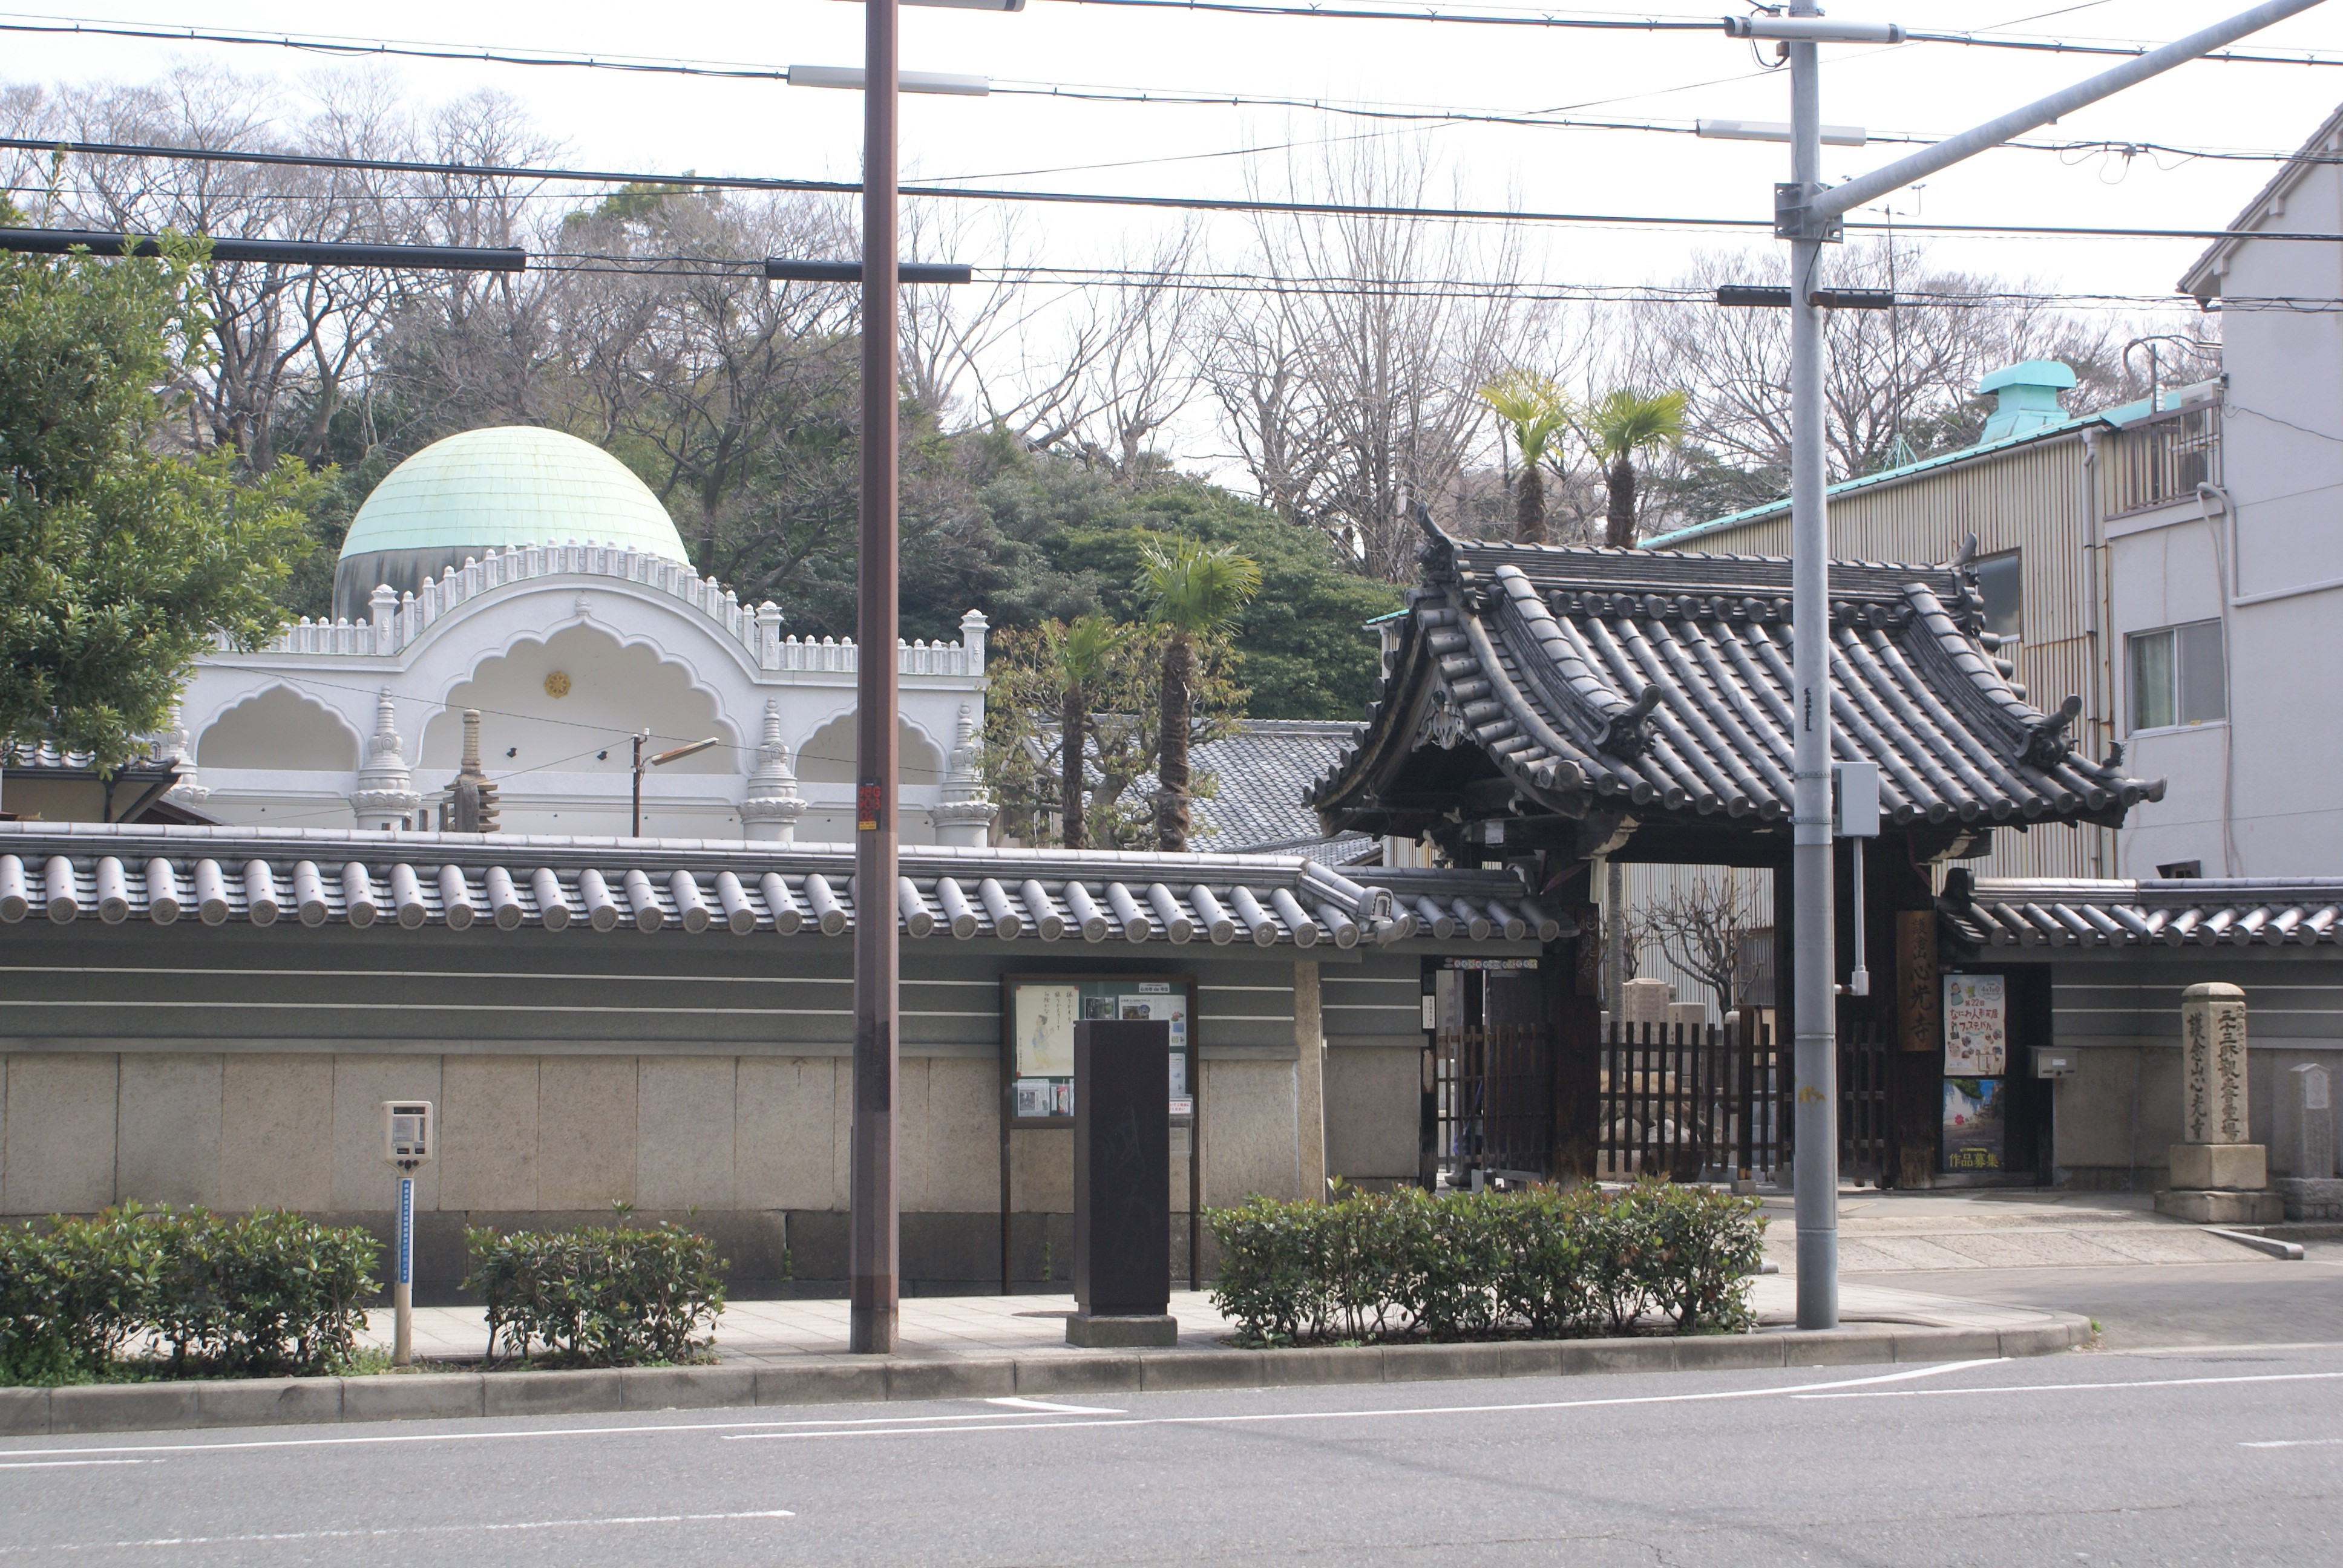 <p>心光寺山門と本堂</p>松屋町筋を挟んで山門とインド風の外観を持つ本堂を見る。松屋町筋に面するこの周辺の寺院は、本堂の前に墓地が広がり、横に庫裏という配置が多い。